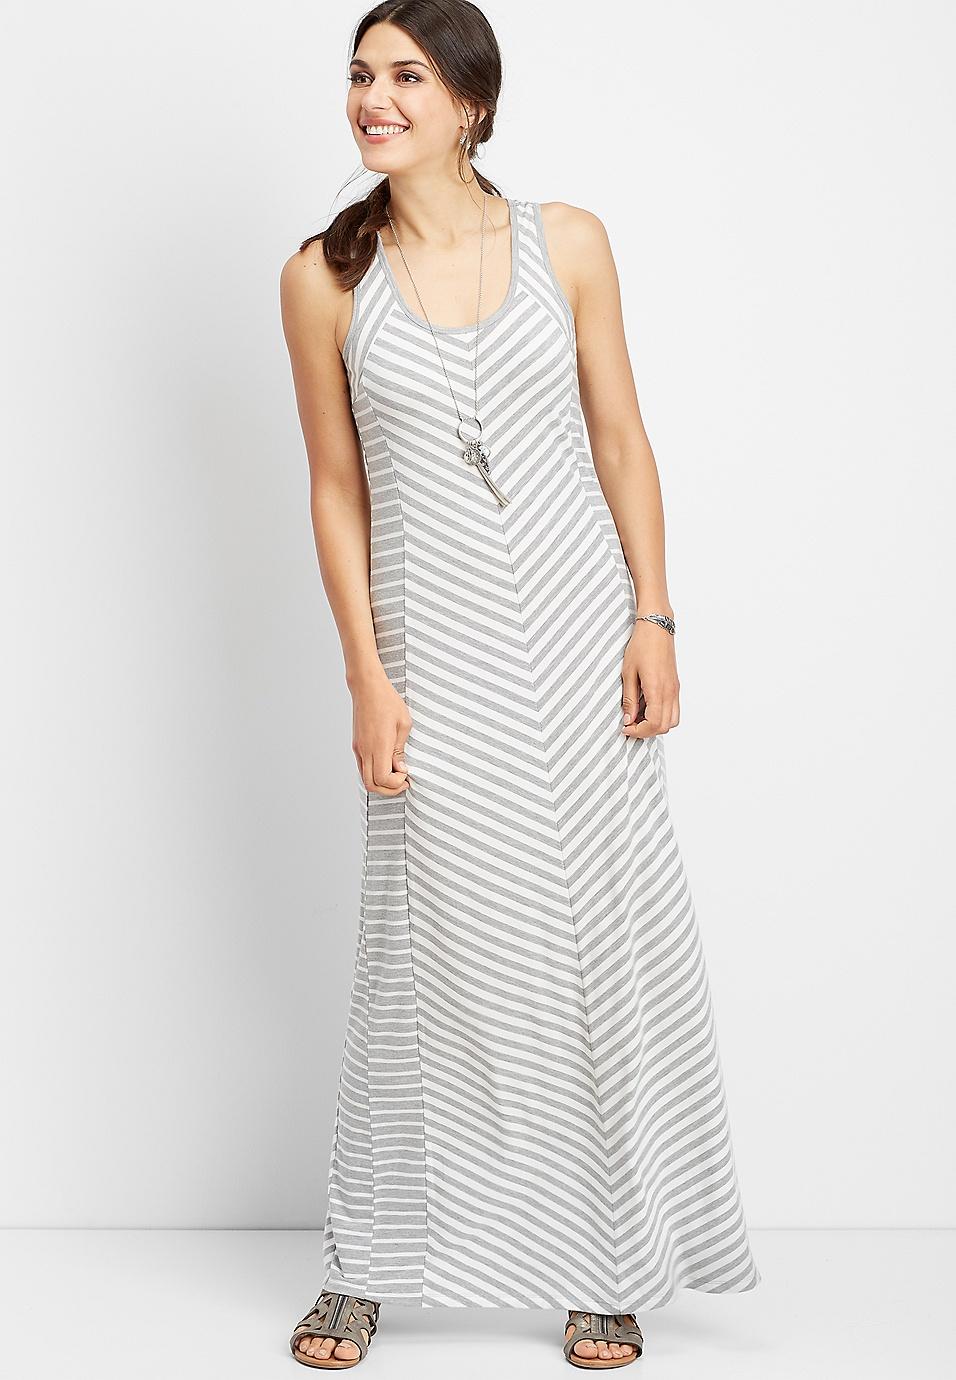 959884f24c0 stripe scoop neck maxi dress